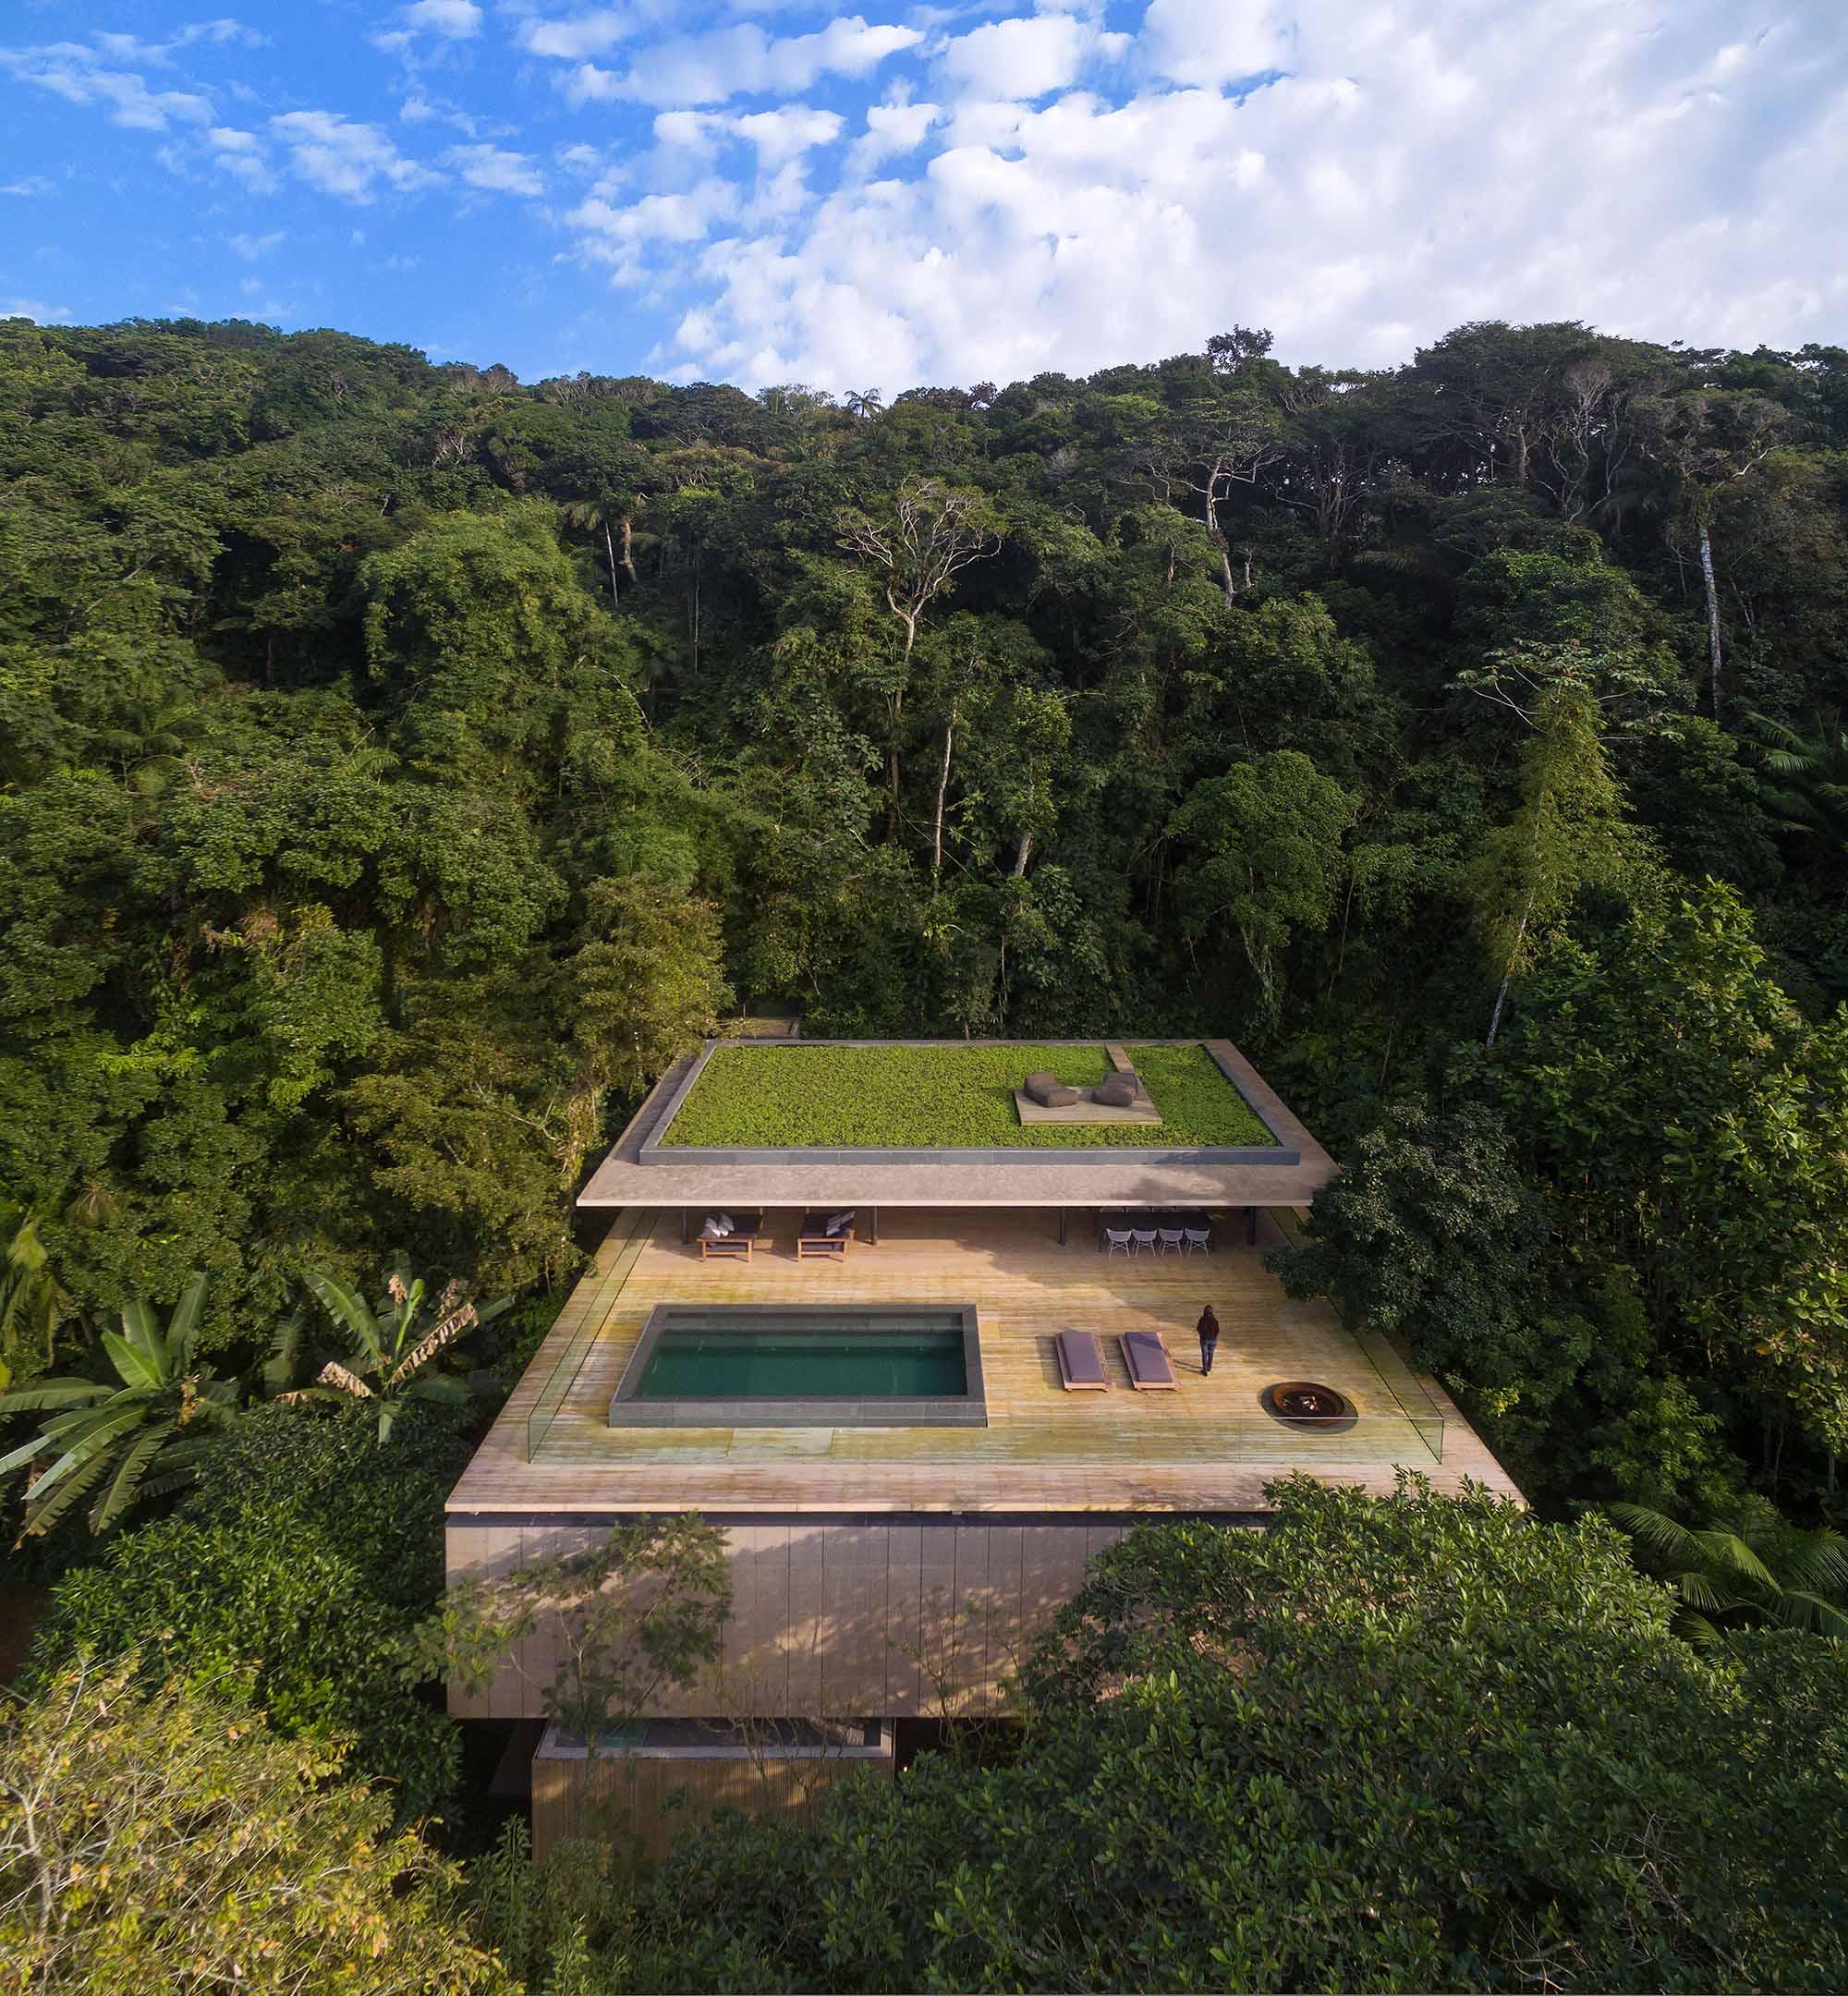 H-House-Life-Jungle-House-Casa-Da-Mata-studio-mk27-mk27_namata_fernandoguerra_medium(39).JPG